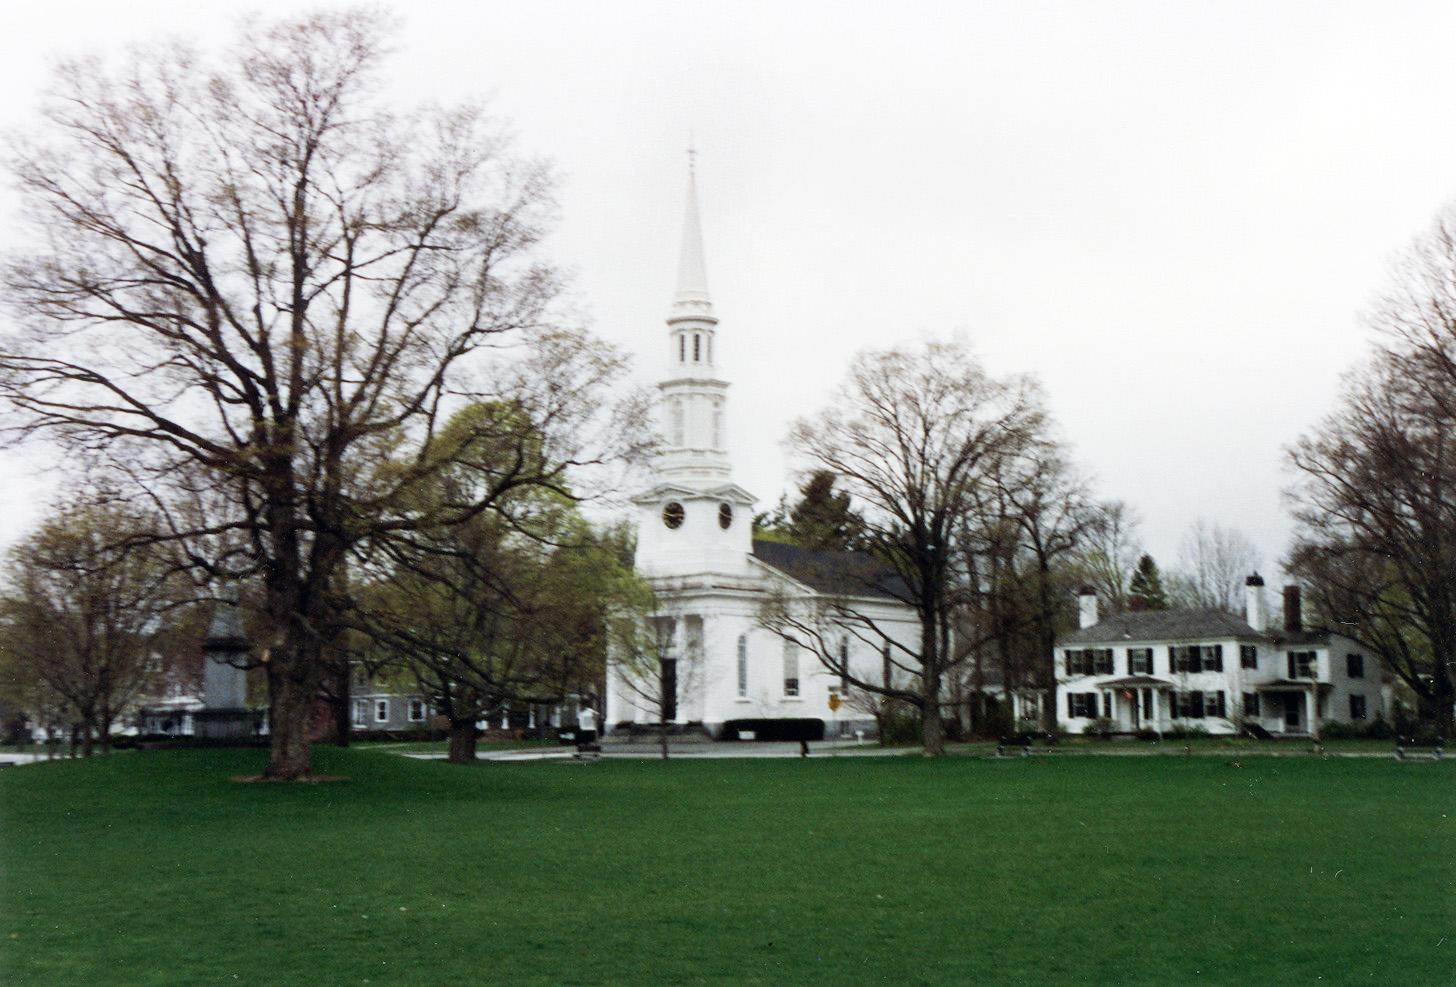 Lexington Green, Lexington, Massachusetts